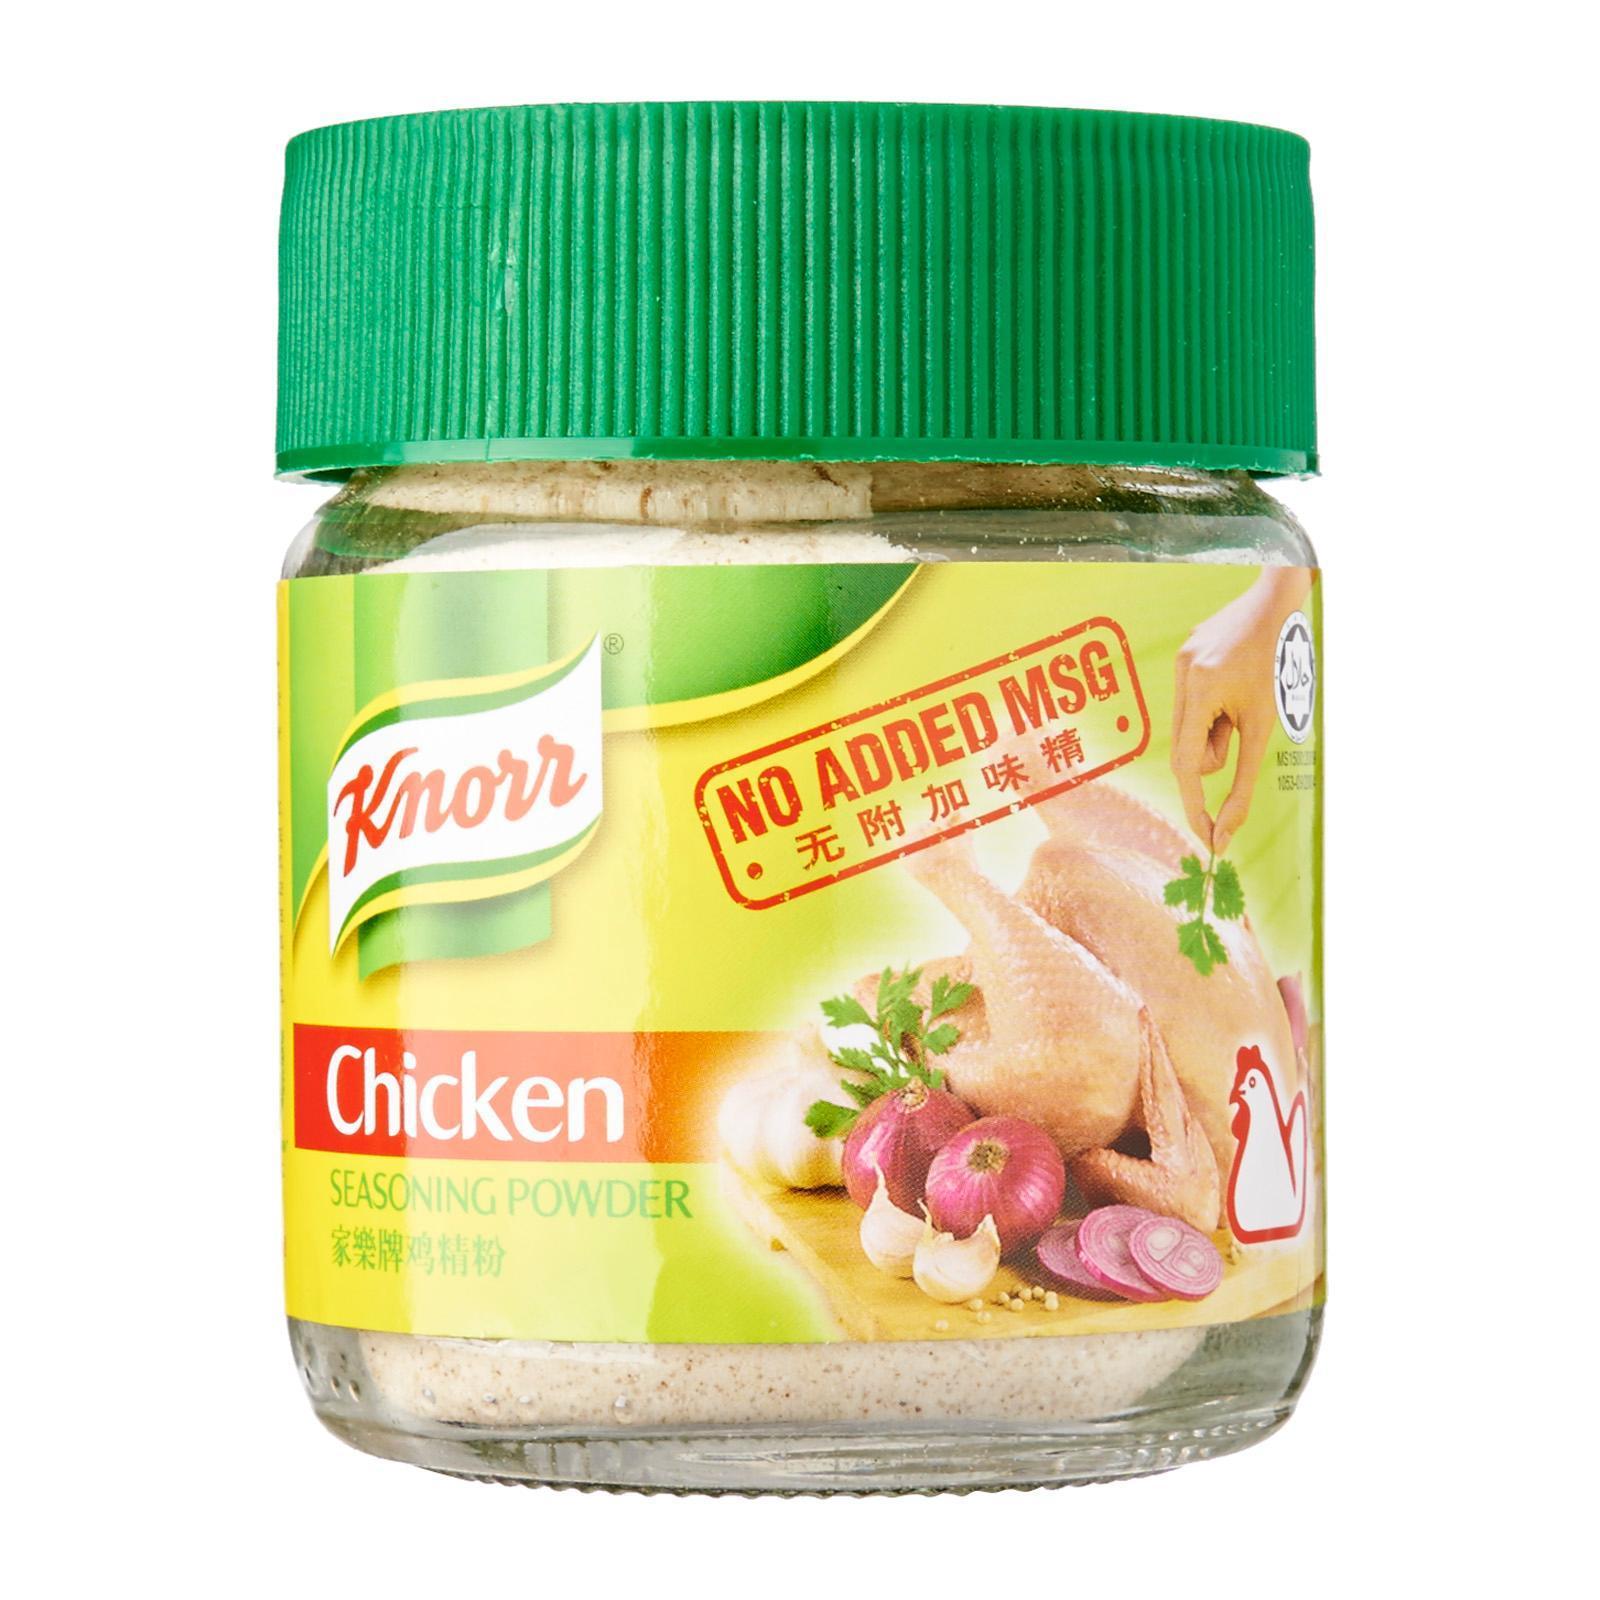 Knorr No Added MSG Chicken Seasoning Powder